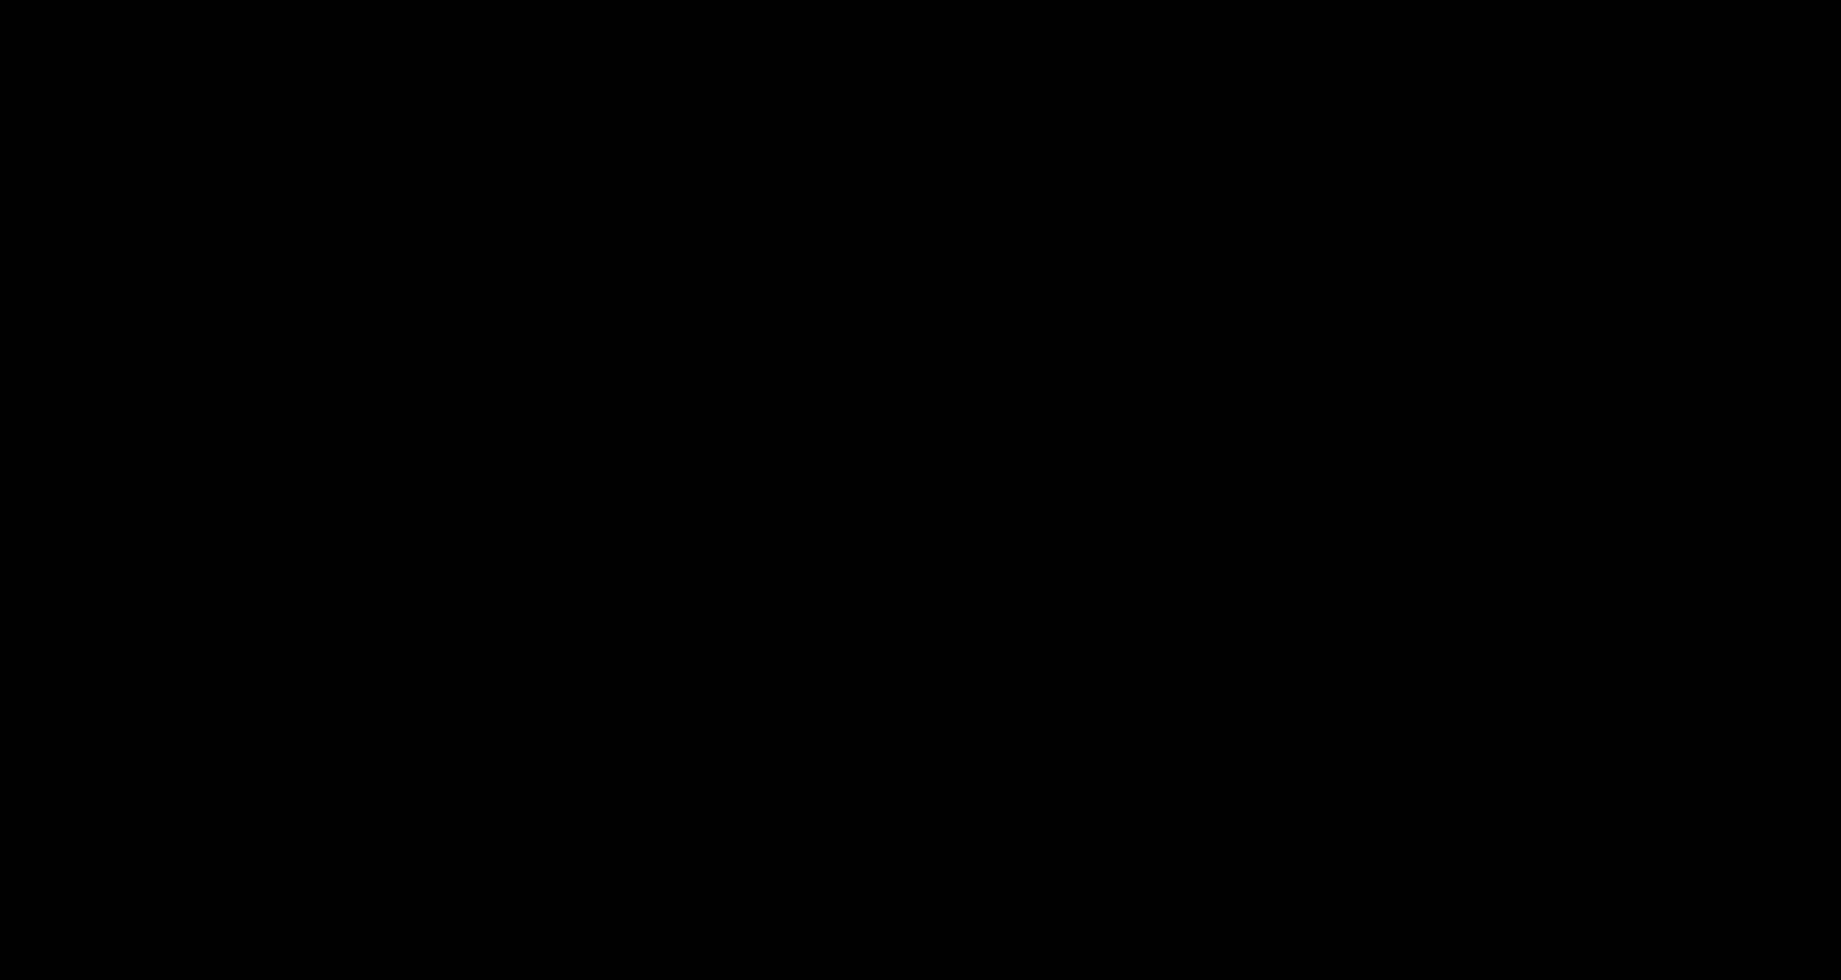 ruban png